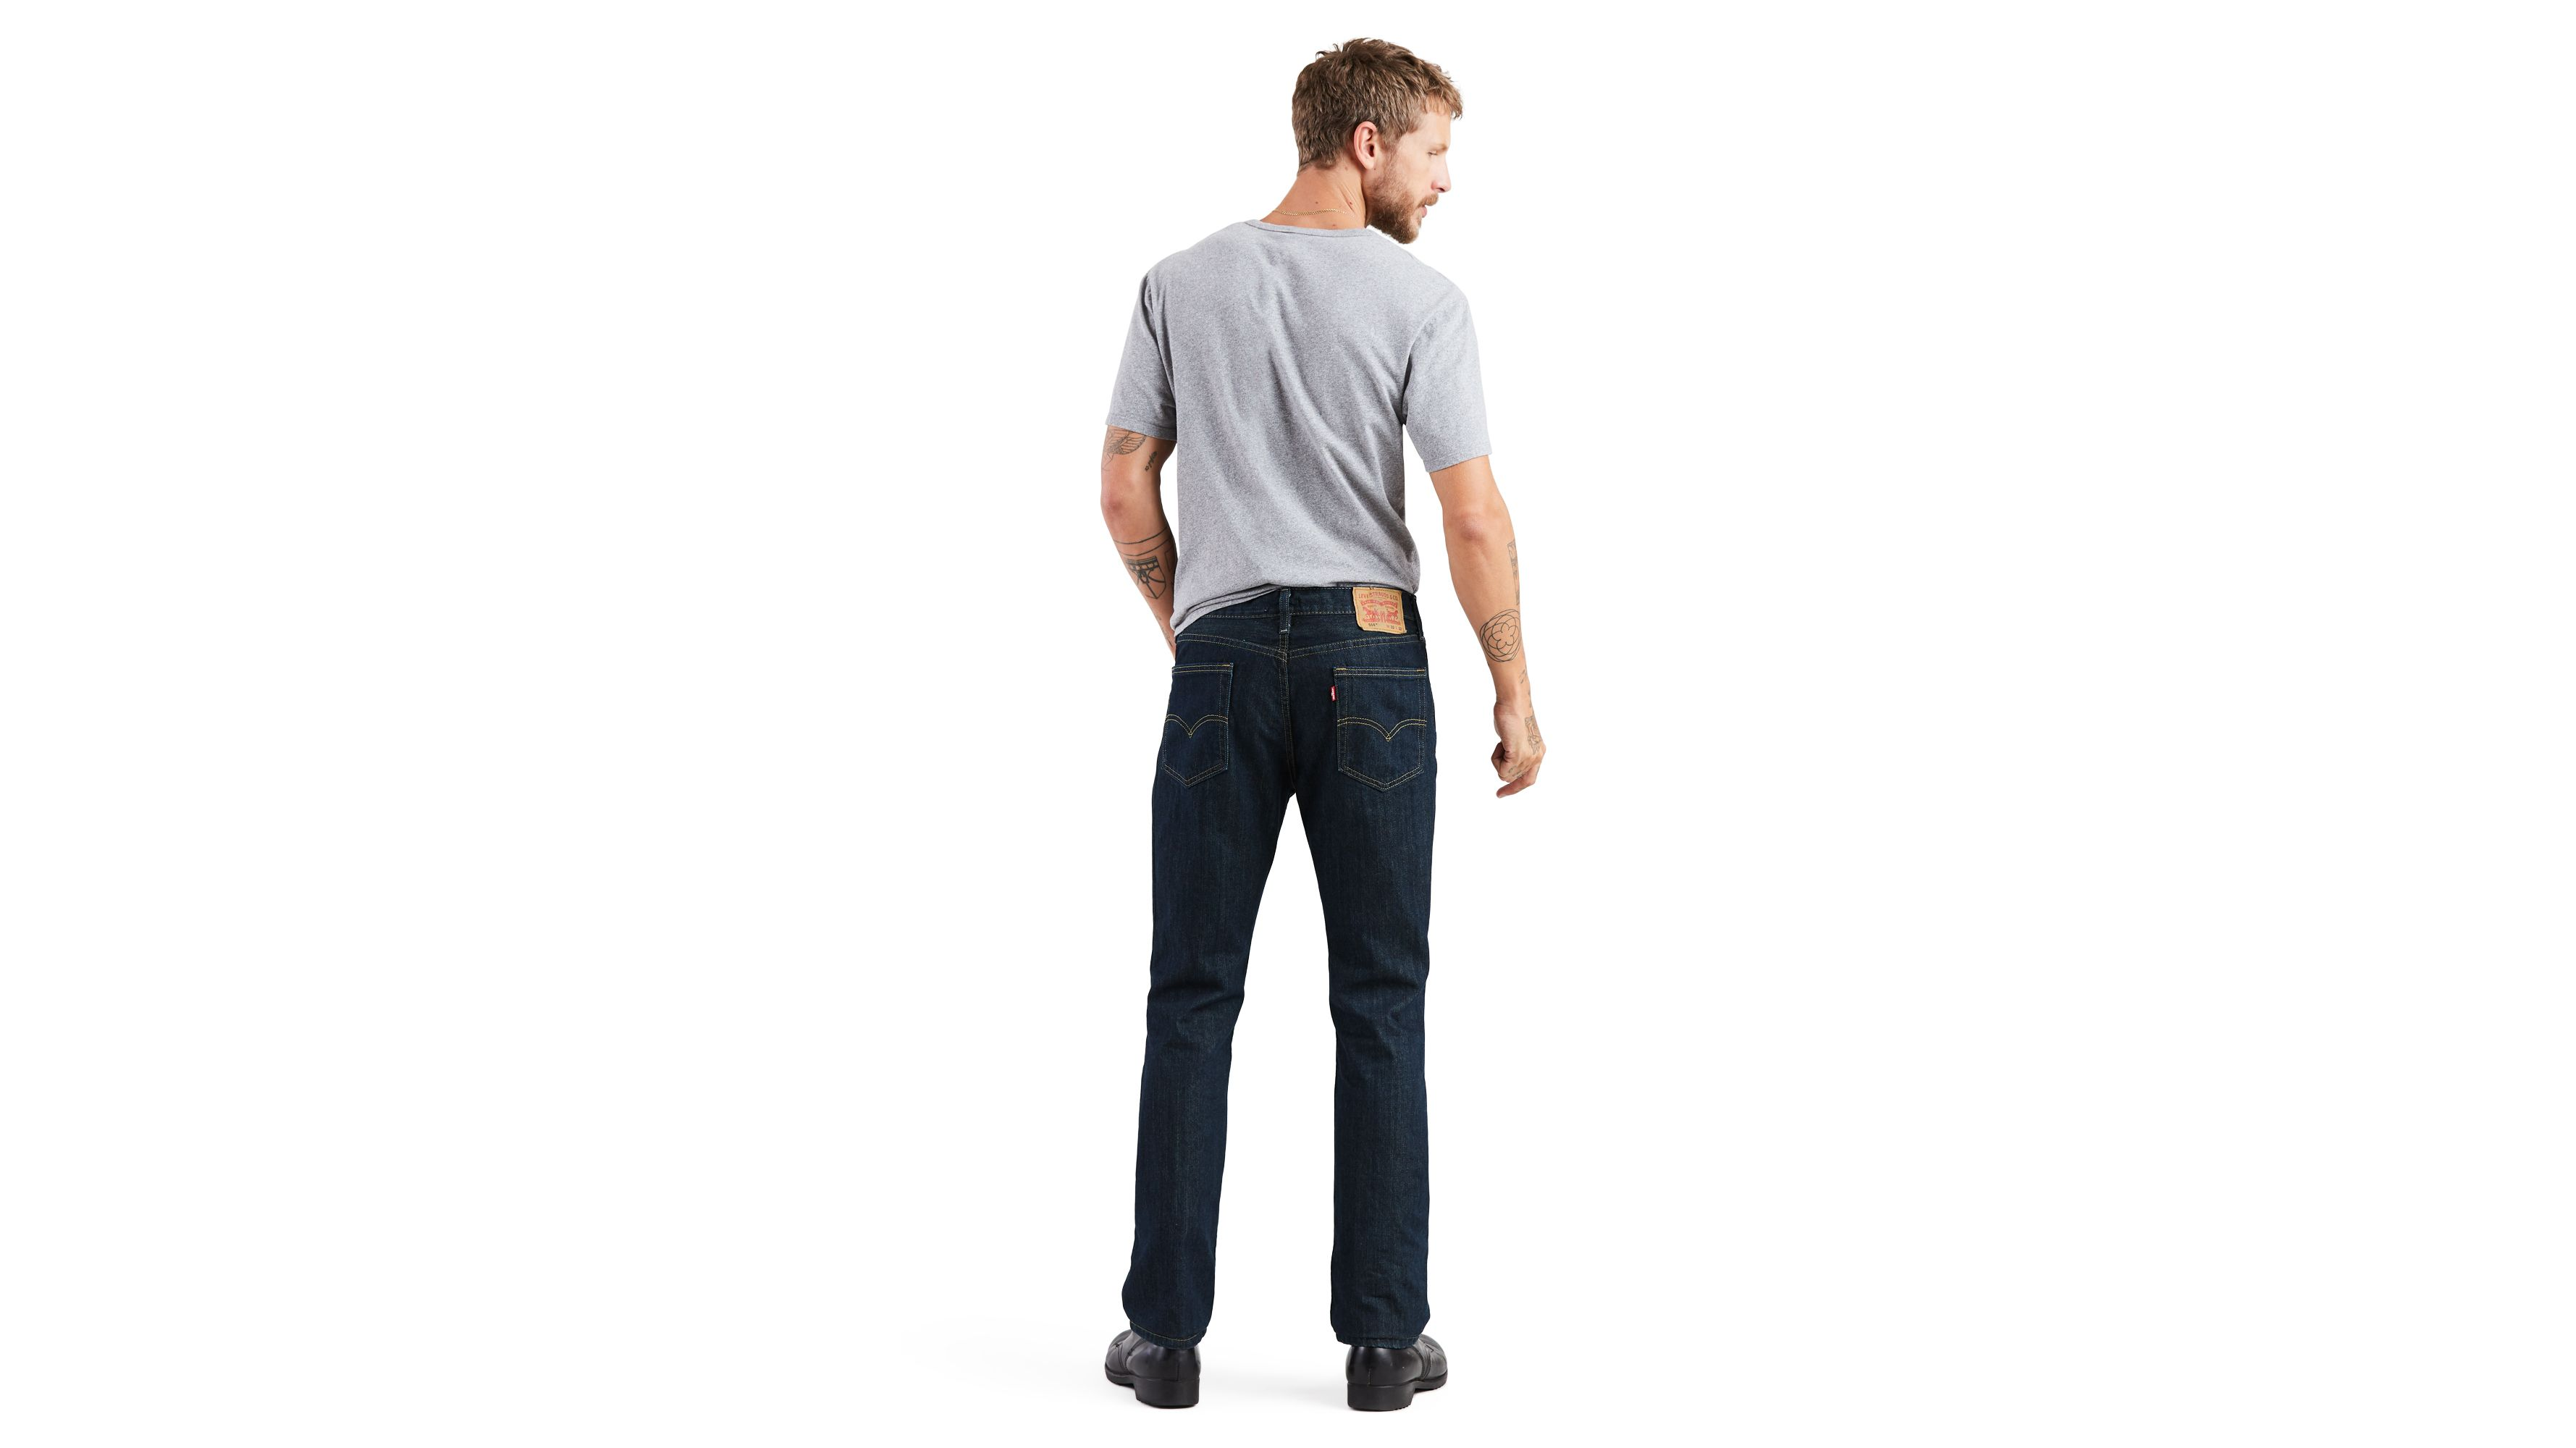 813460715c3 514™ Straight Fit Men's Jeans - Dark Wash | Levi's® US